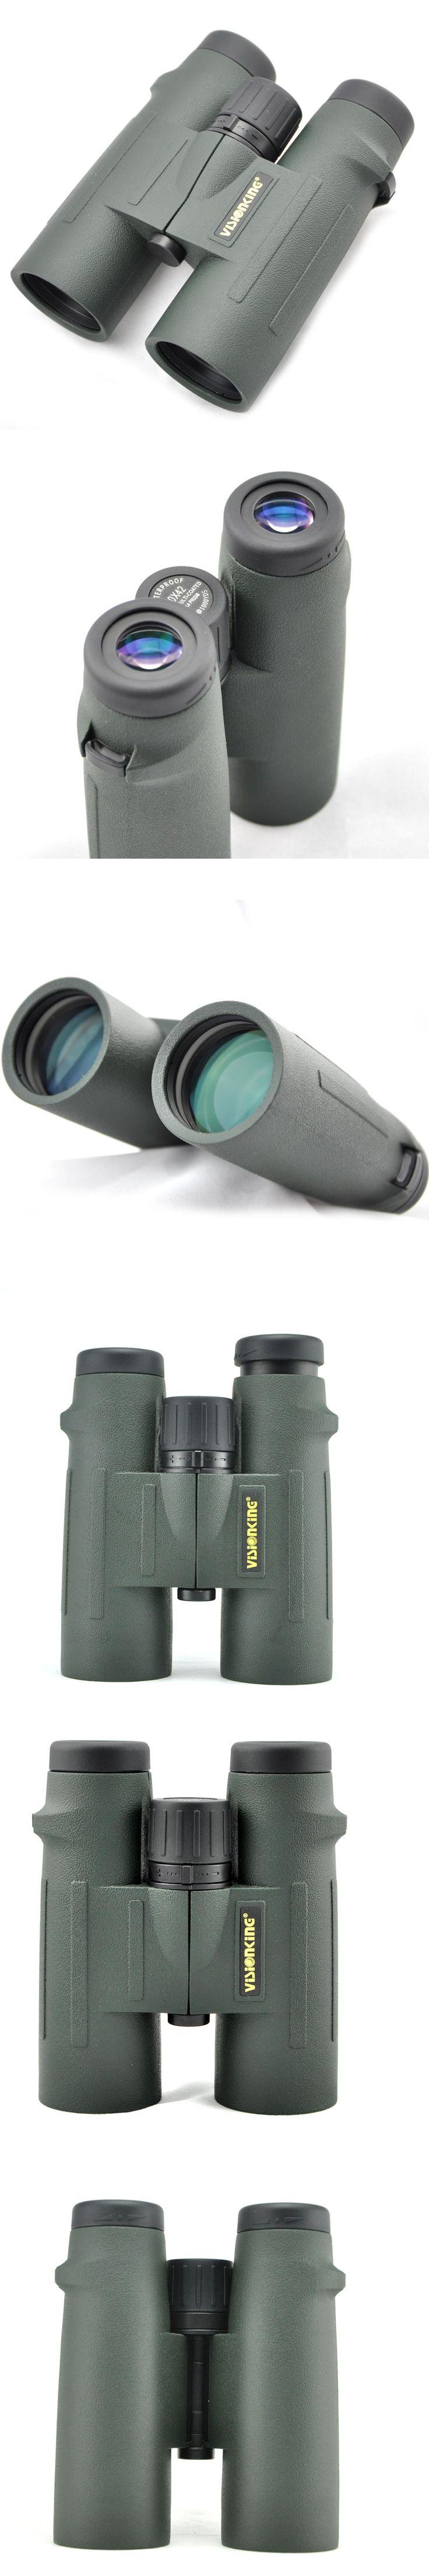 Visionking 10x42 Hunting Binocular Waterproof  Bak4 Fogproof Binoculars Camping Professional Telescope Travelling Binoculars